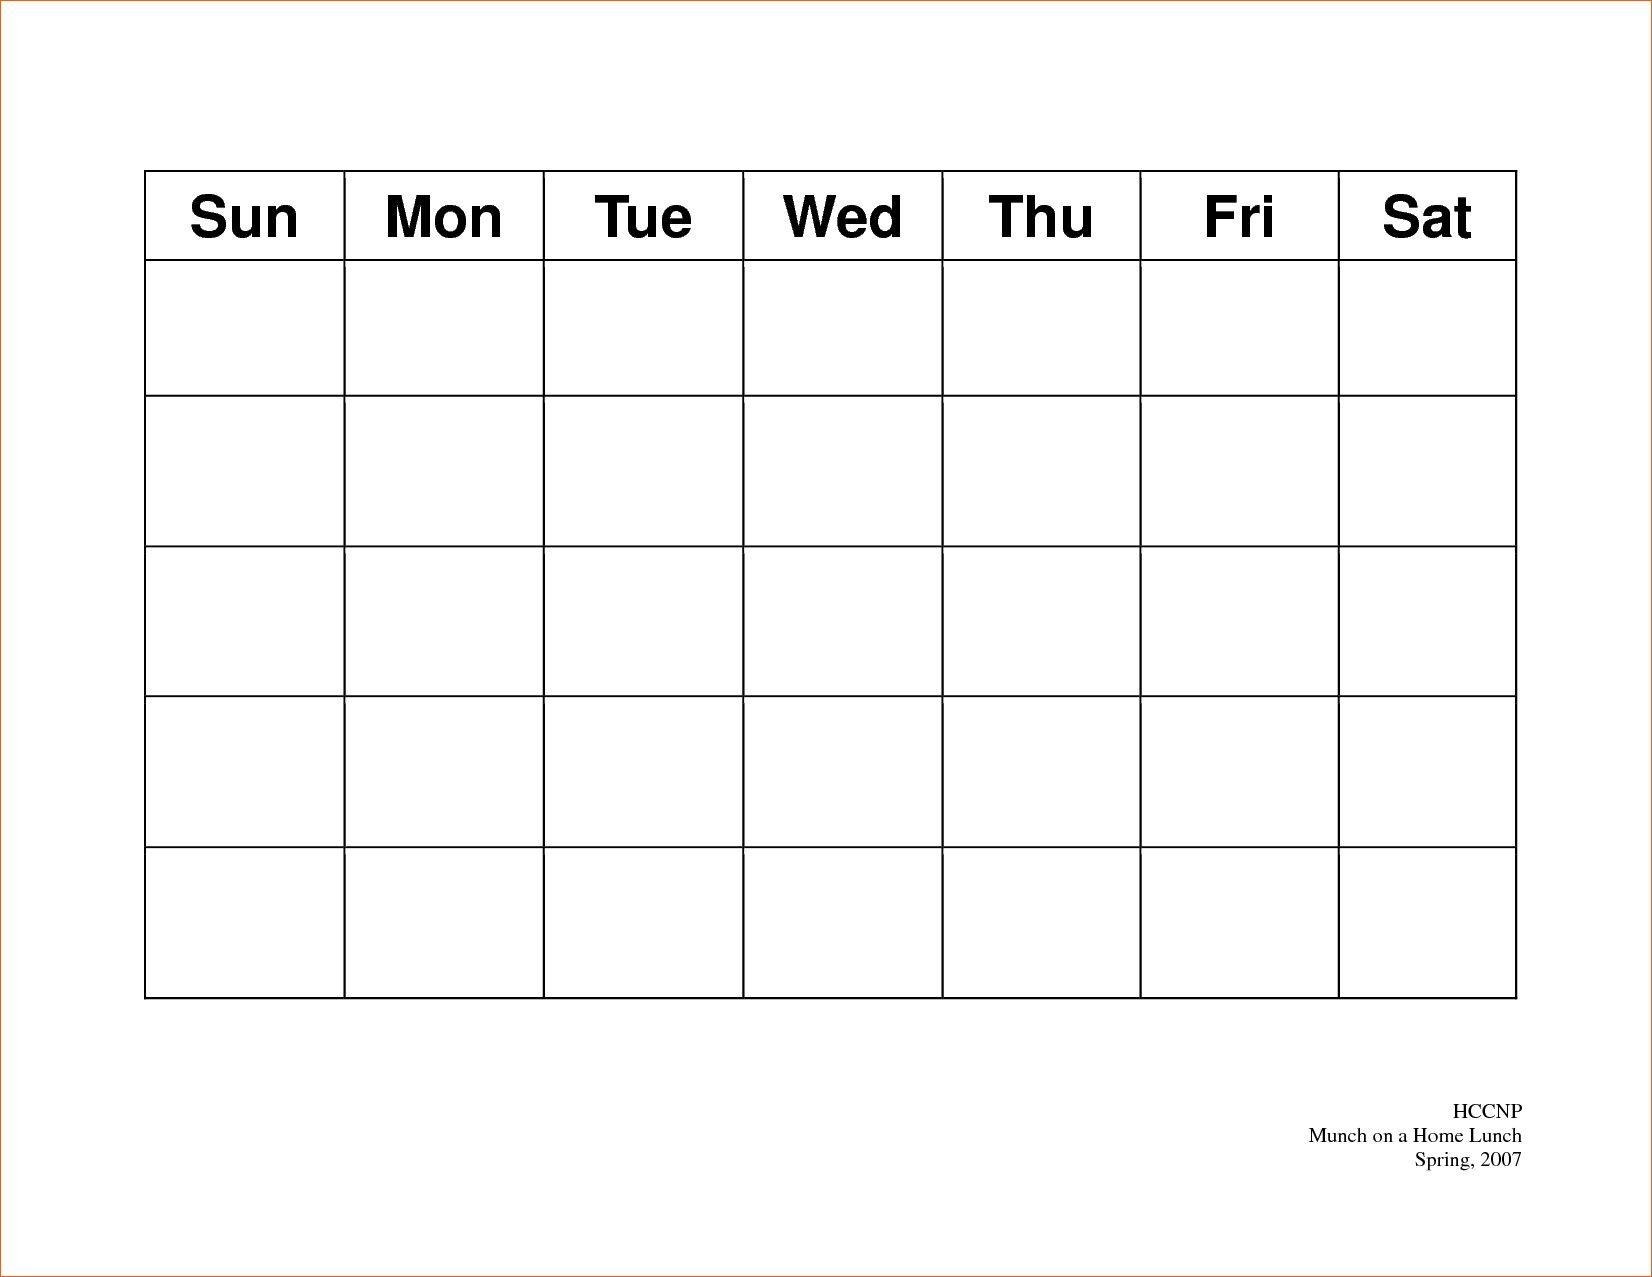 Calendar 5 Day Weekly Calendar Template On 5 Week Calendar pertaining to 5 Day Weekly Calendar